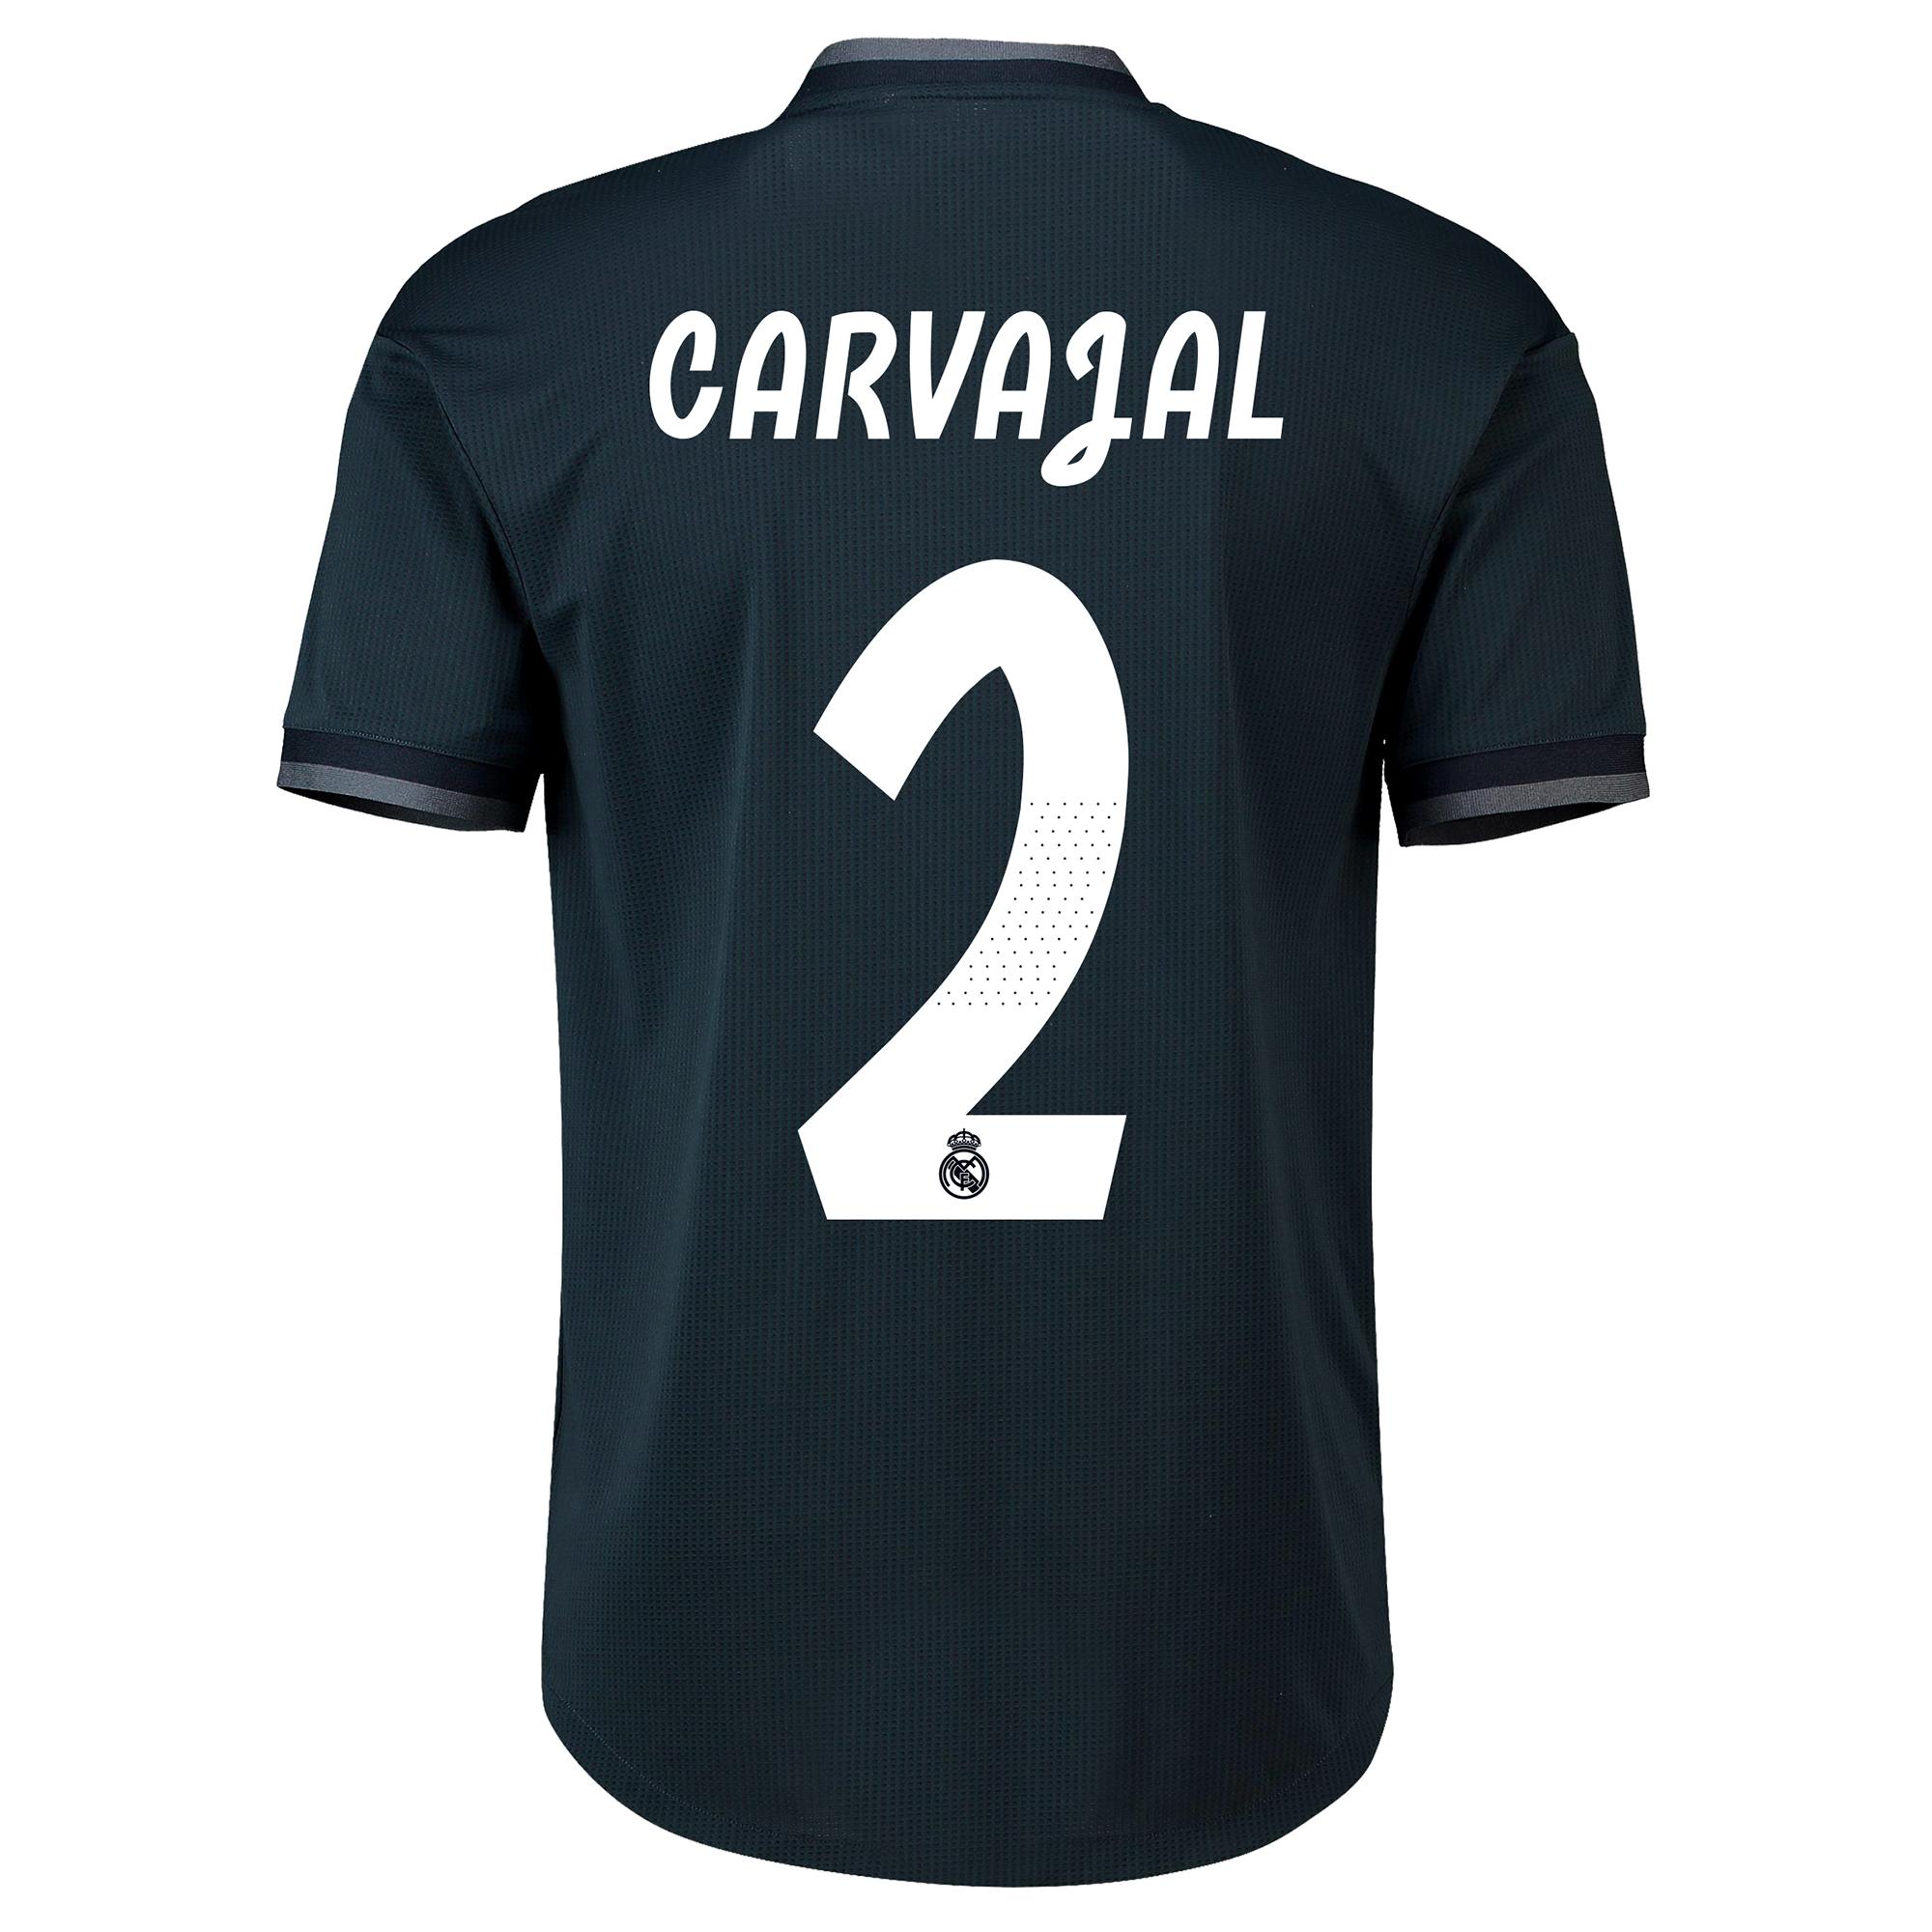 Image of Real Madrid Away Adi Zero Shirt 2018-19 with Carvajal 2 printing